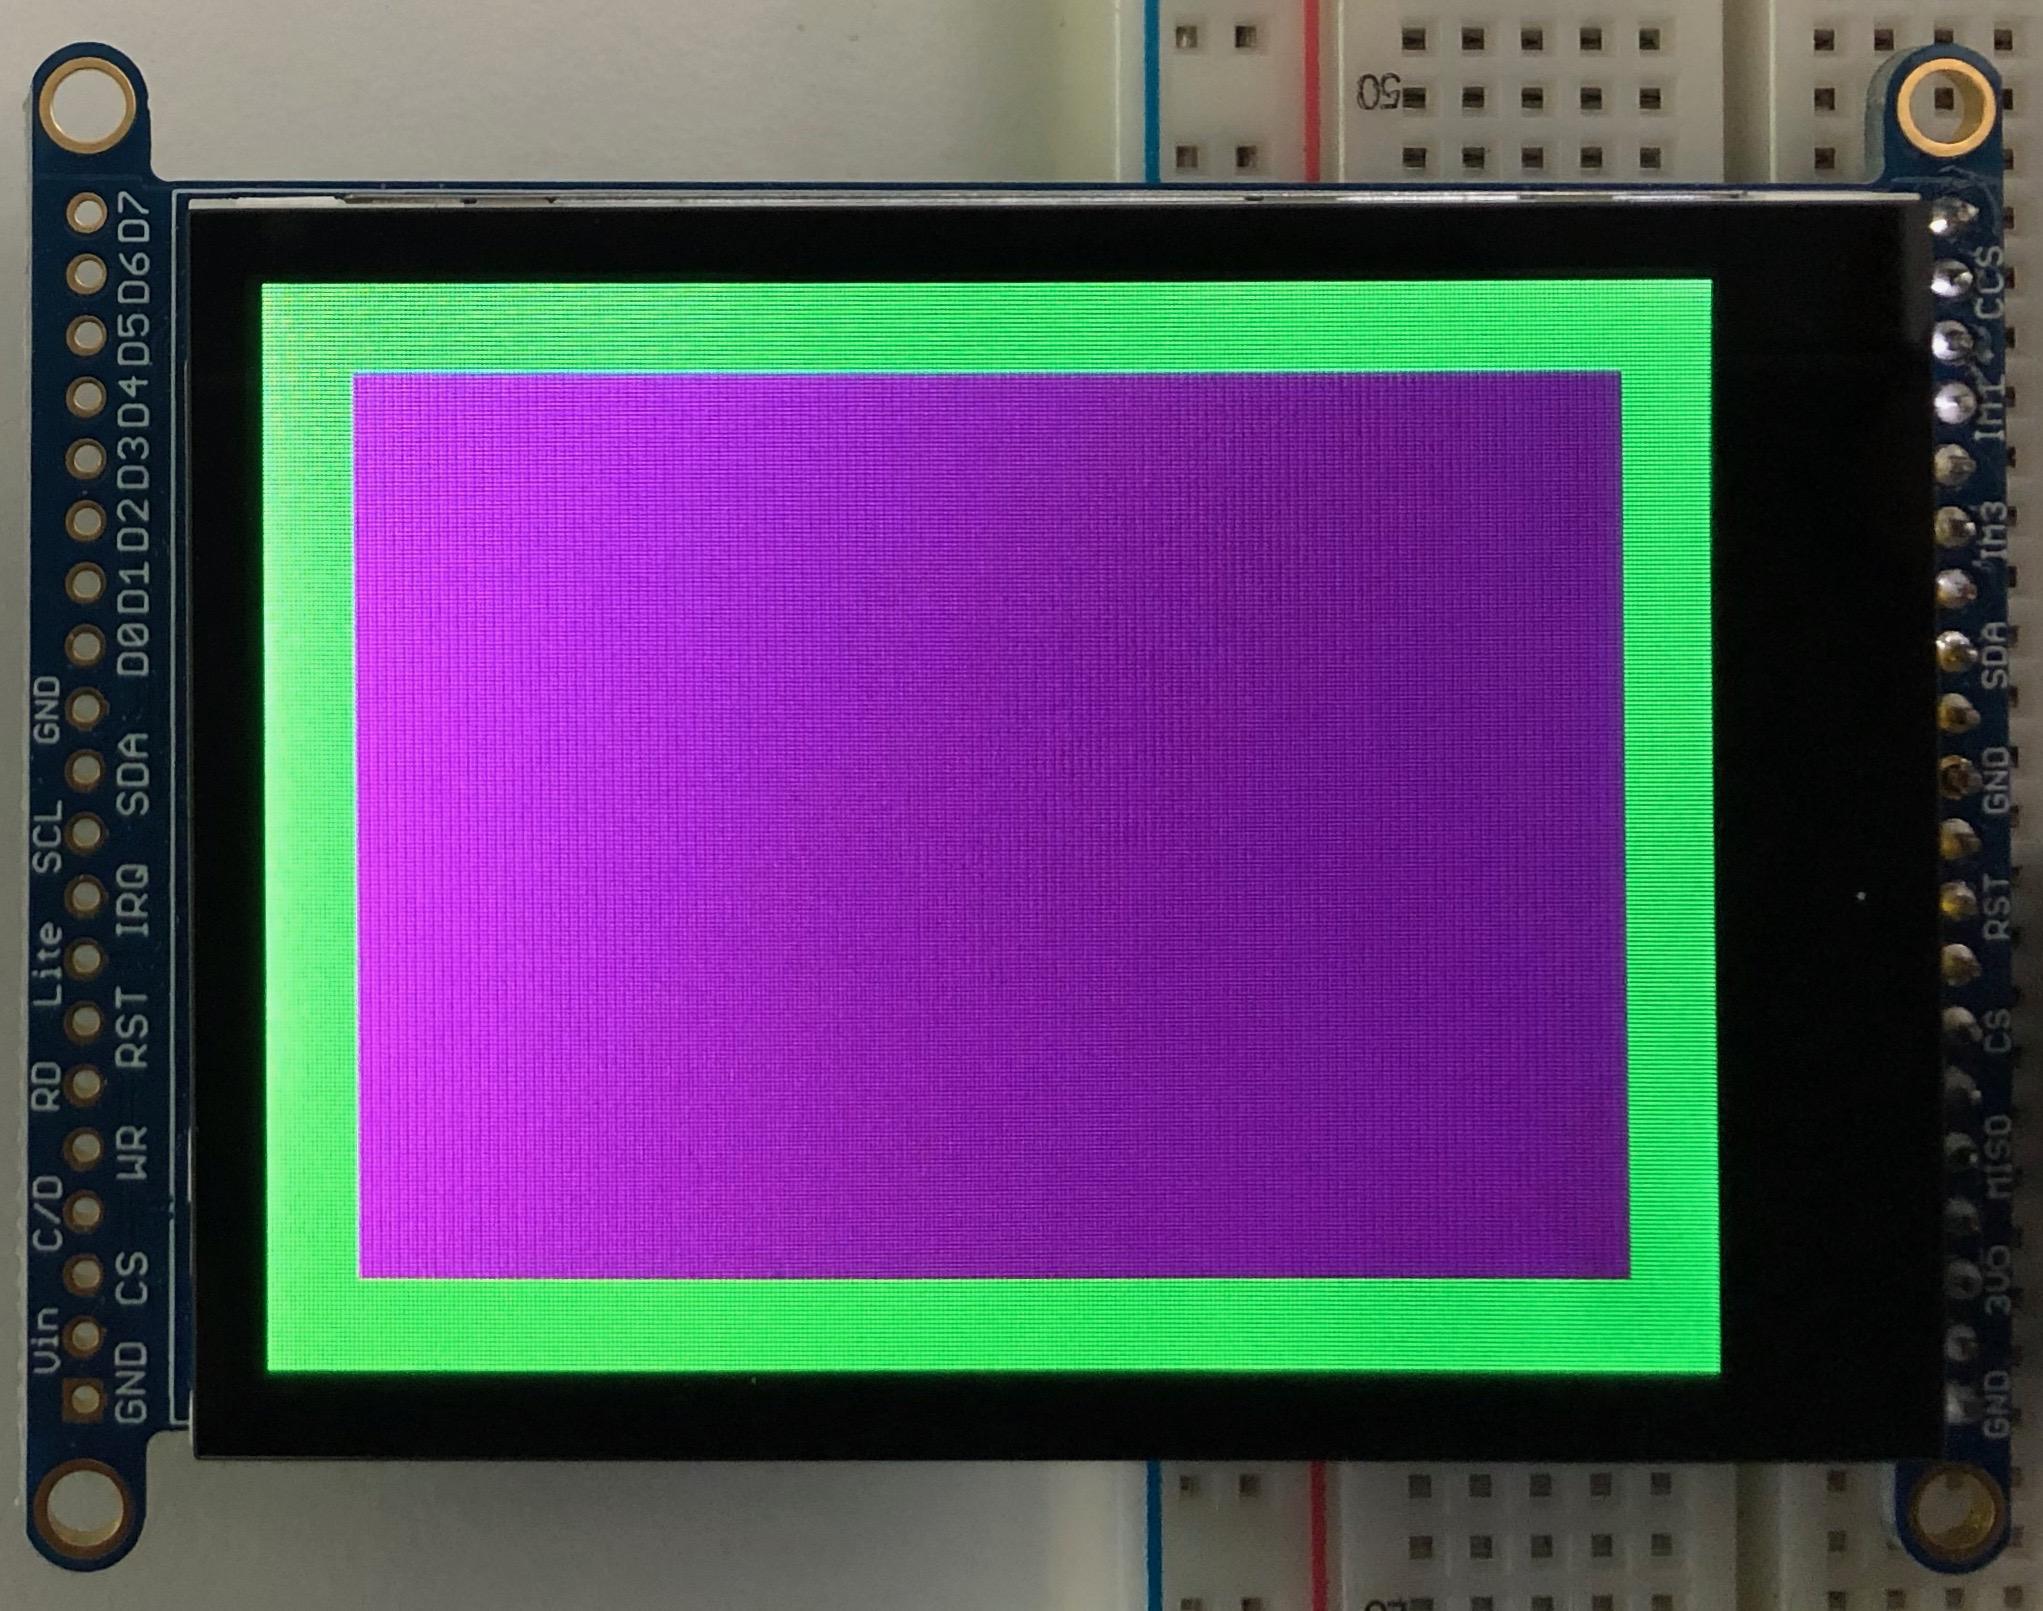 adafruit_products_2.8-green-purple.jpeg